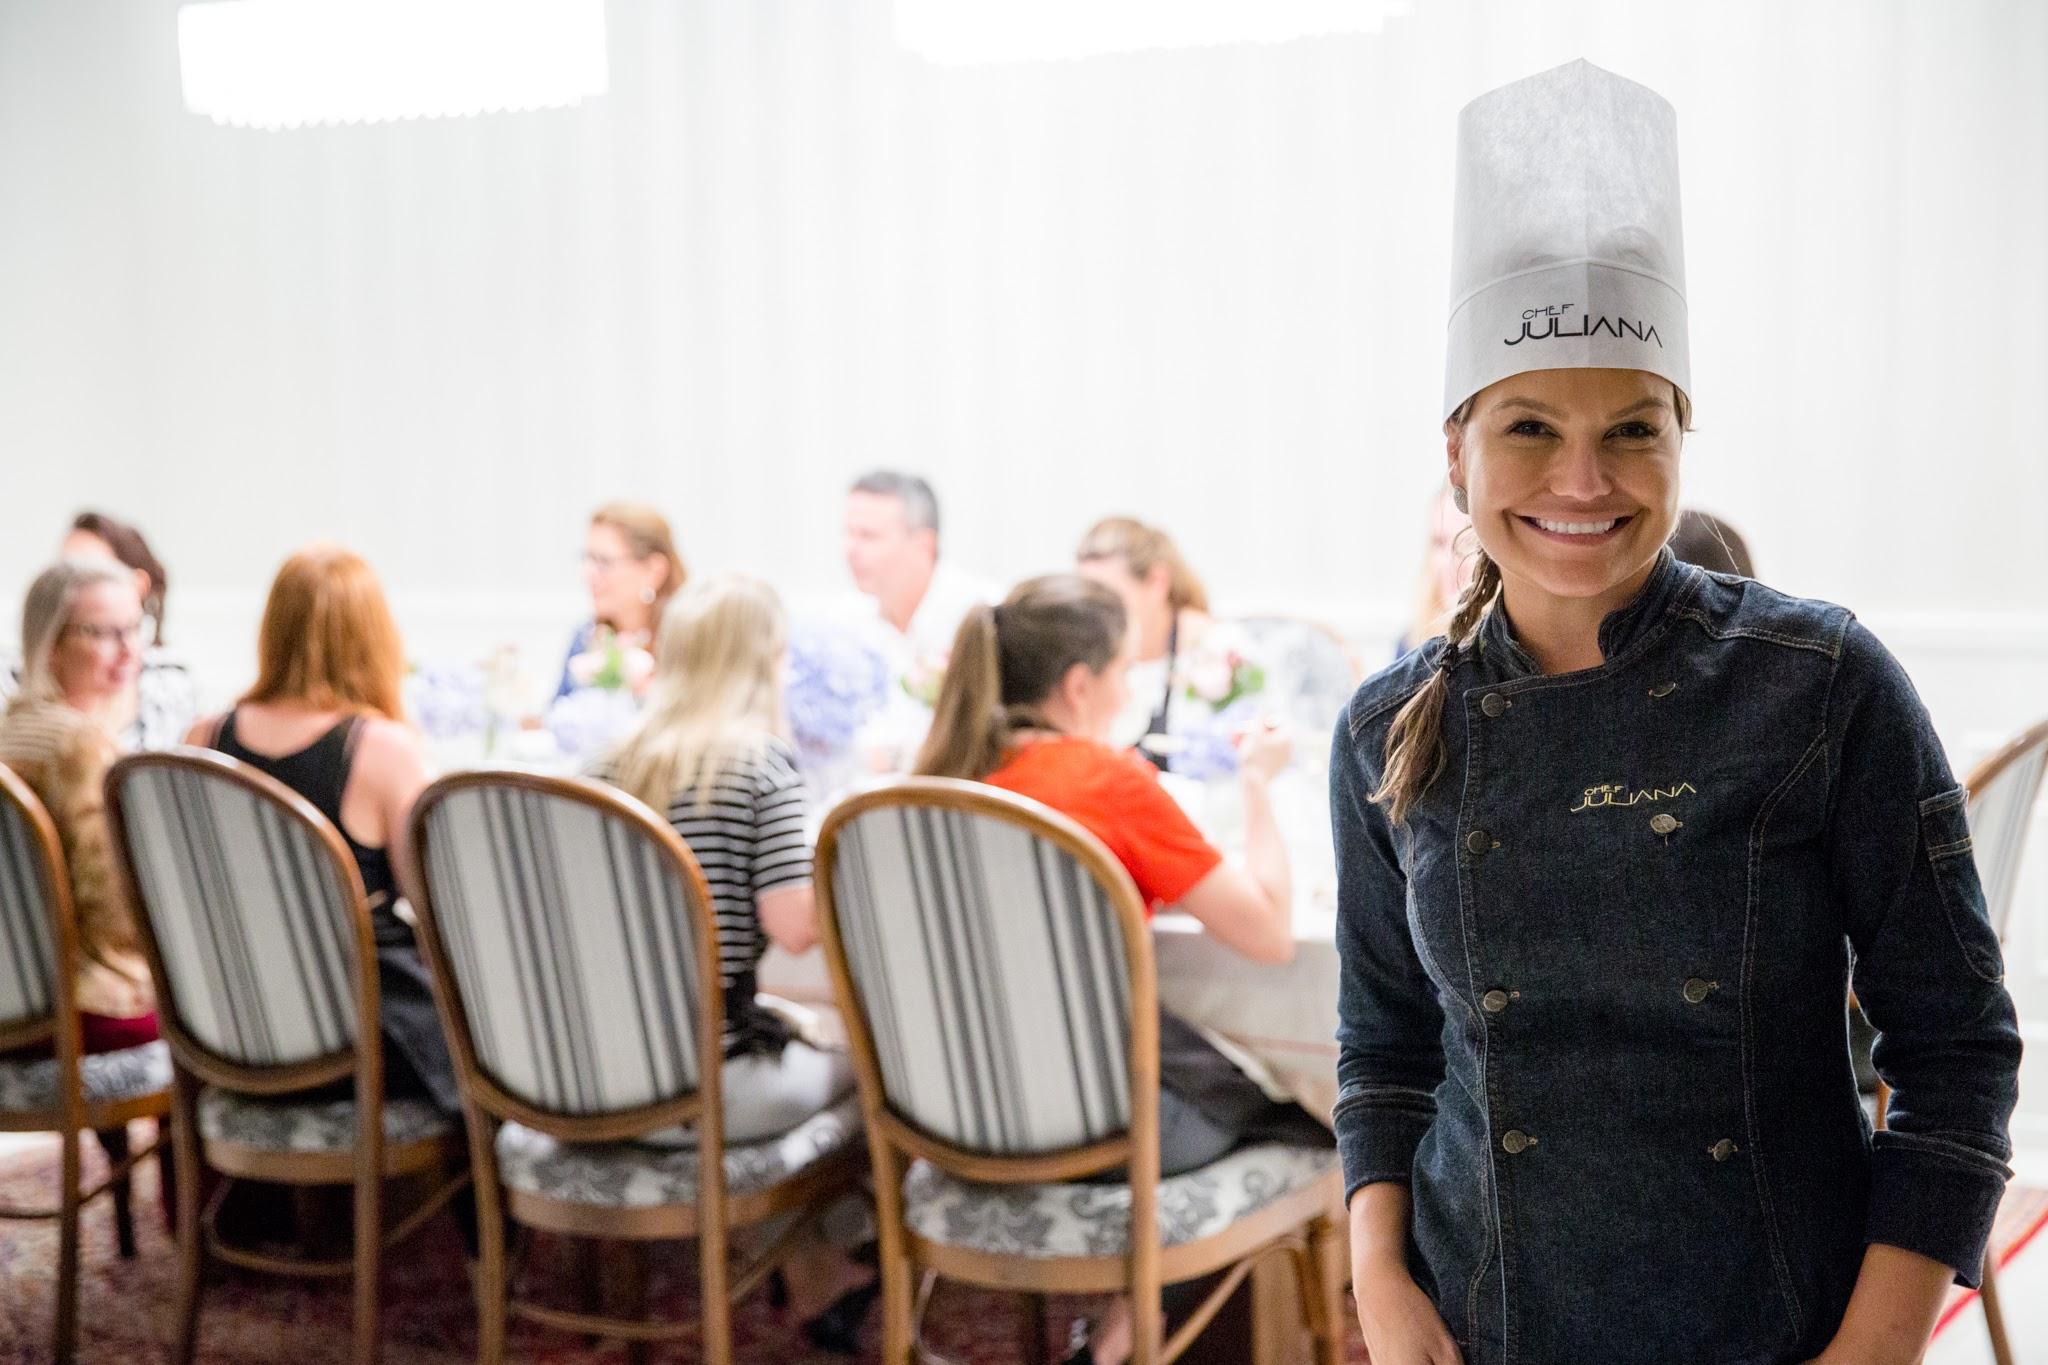 notícia, gourmetice, cook experience, noite francesa, chef, juliana correa, porto alegre, poa